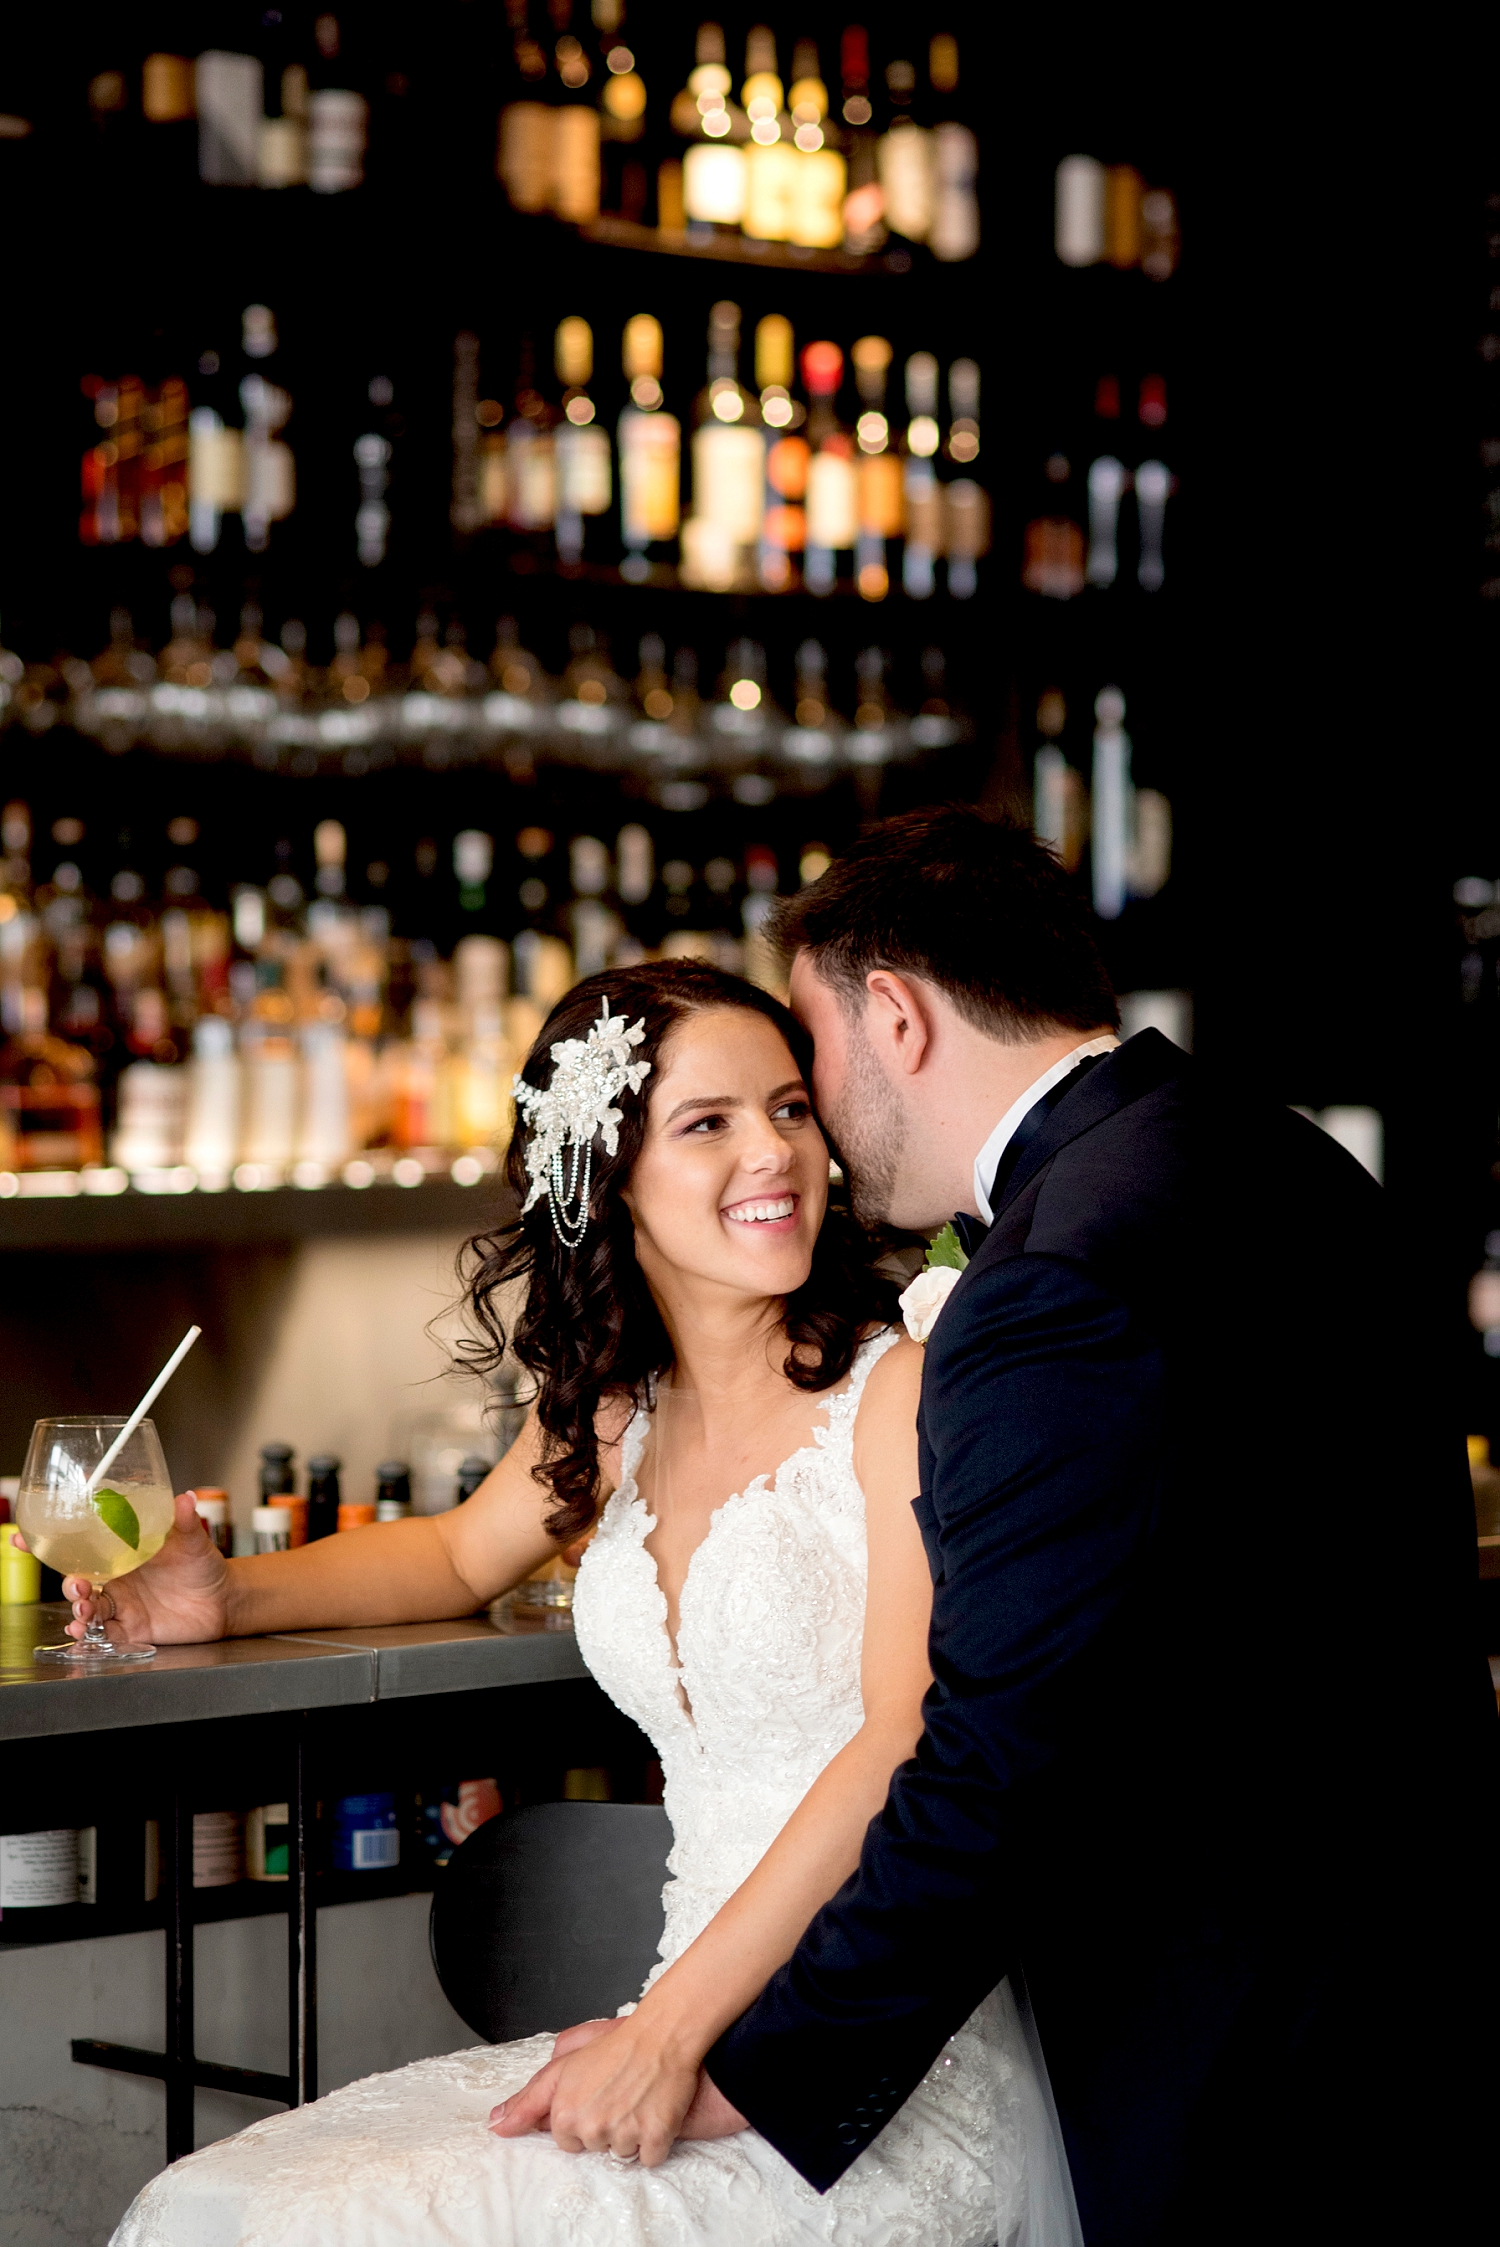 171_perth wedding photographer deray simcoe .jpg